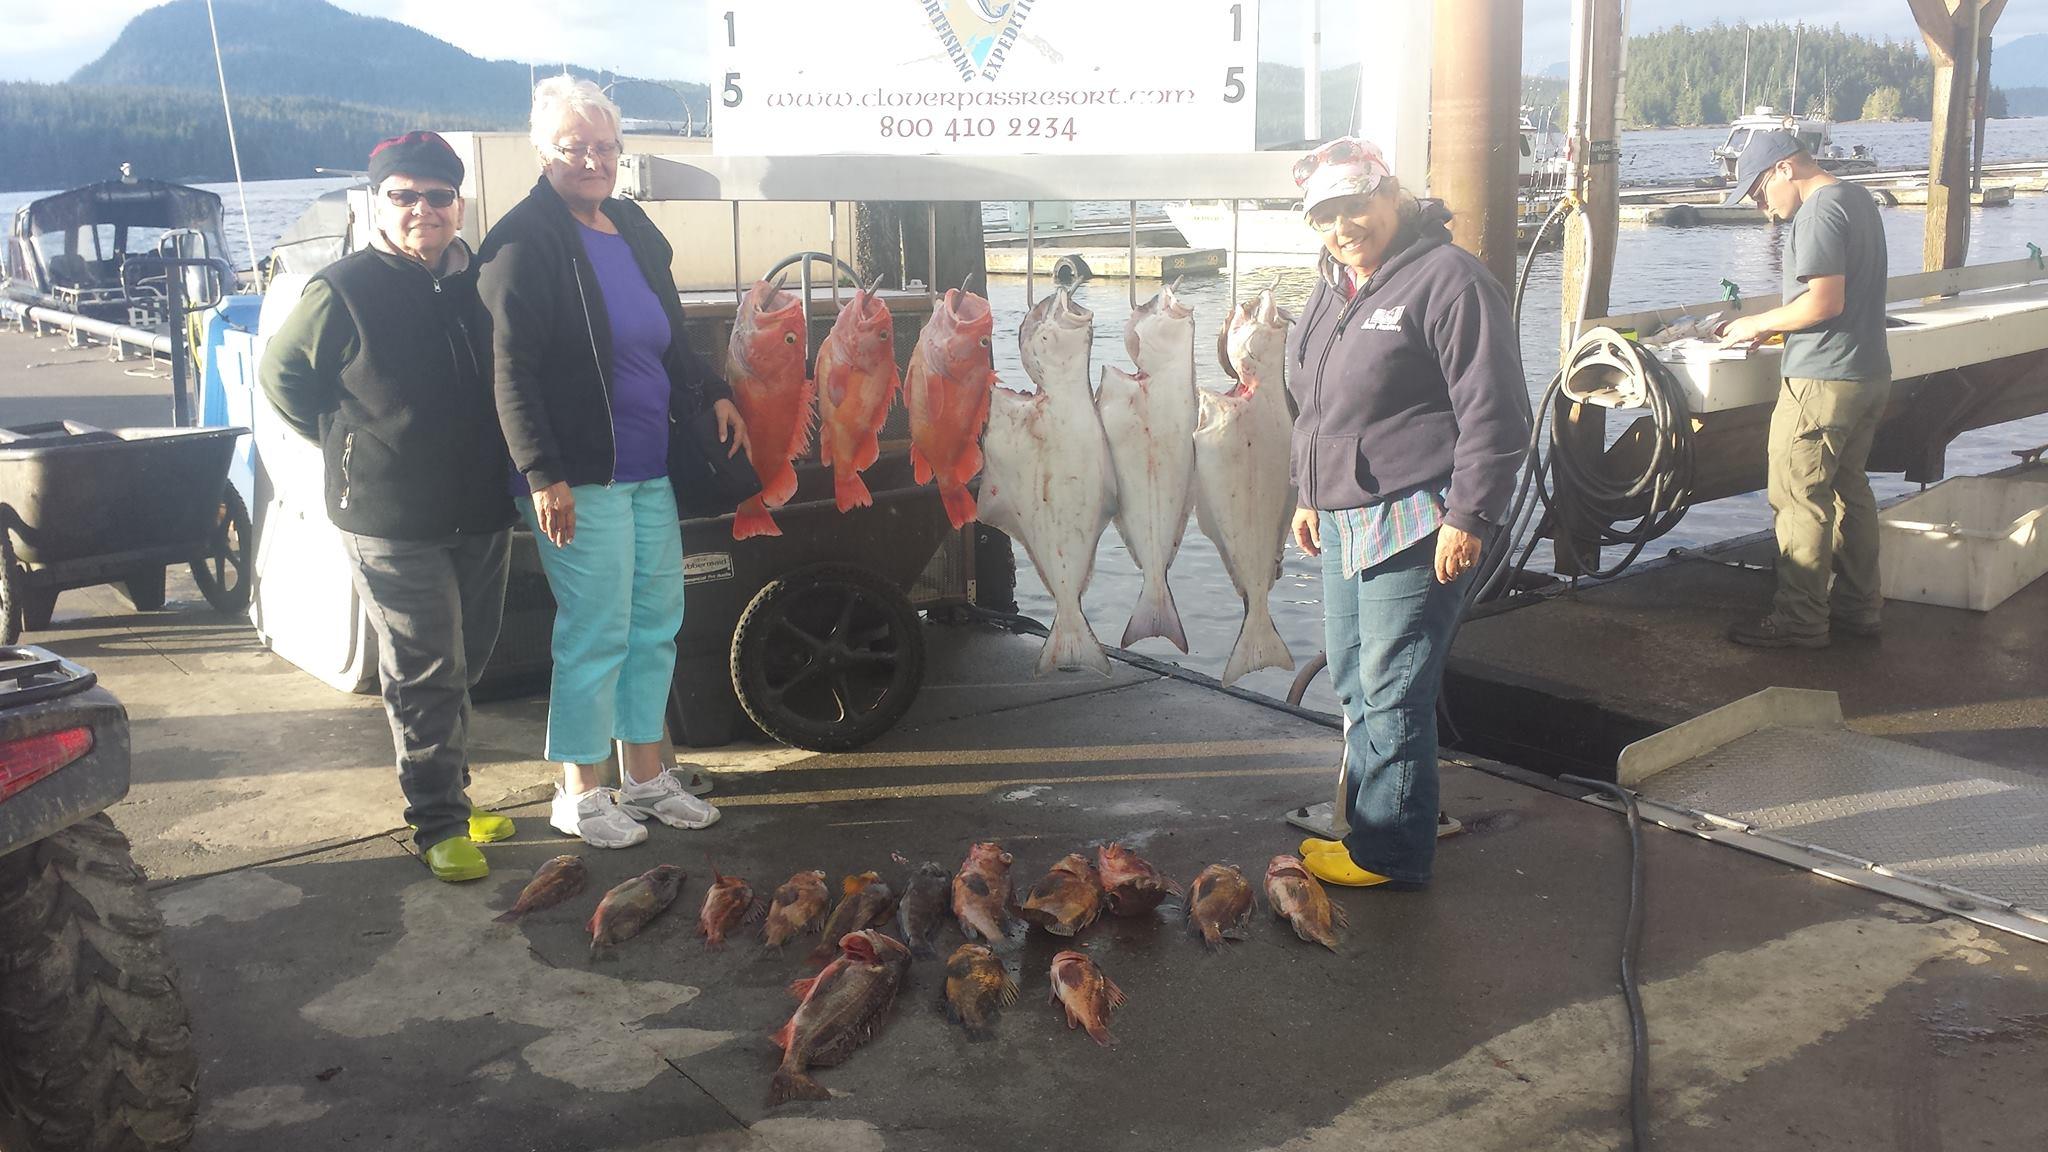 Fishing in Ketchikan with Oasis Alaska Charters 08202015